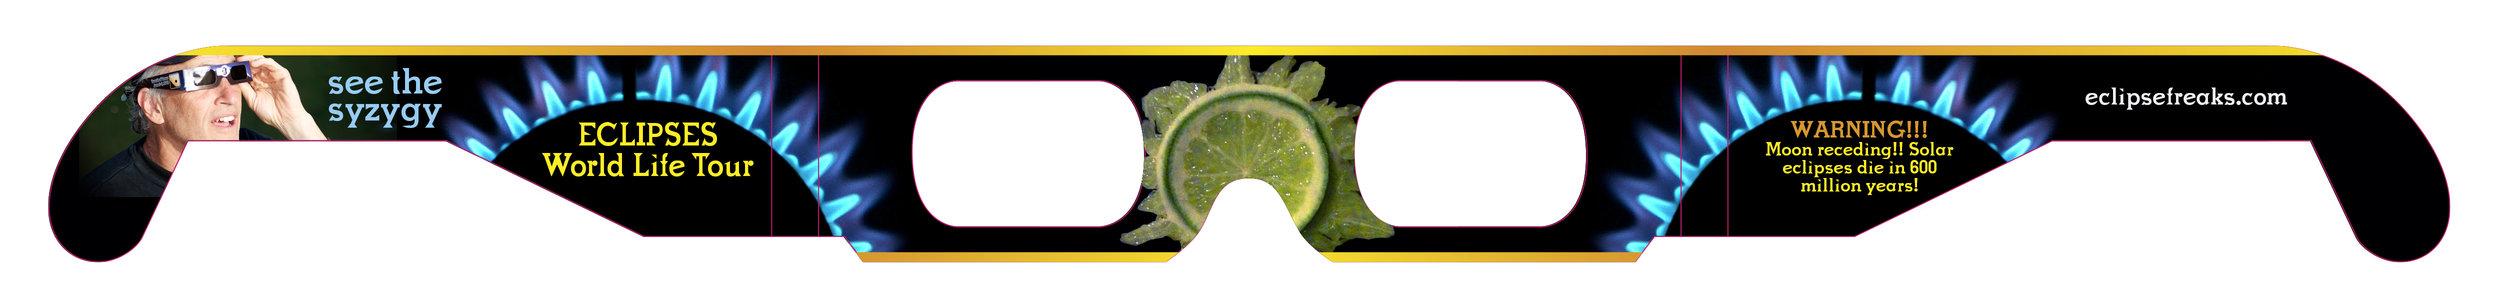 MDAeclipseGlasses-web.jpg